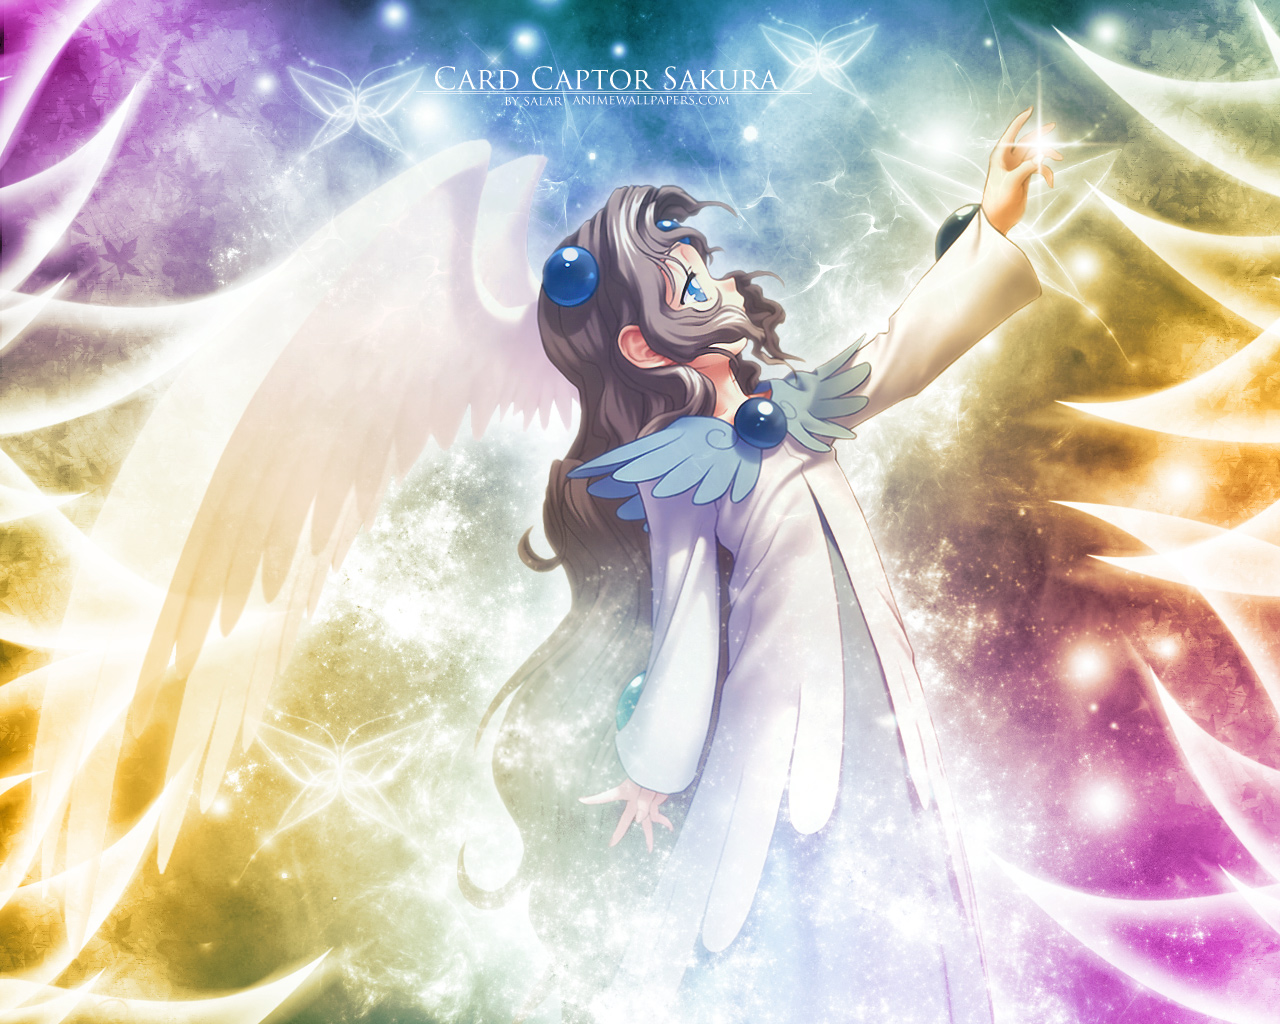 Card Captor Sakura Anime Wallpaper # 108